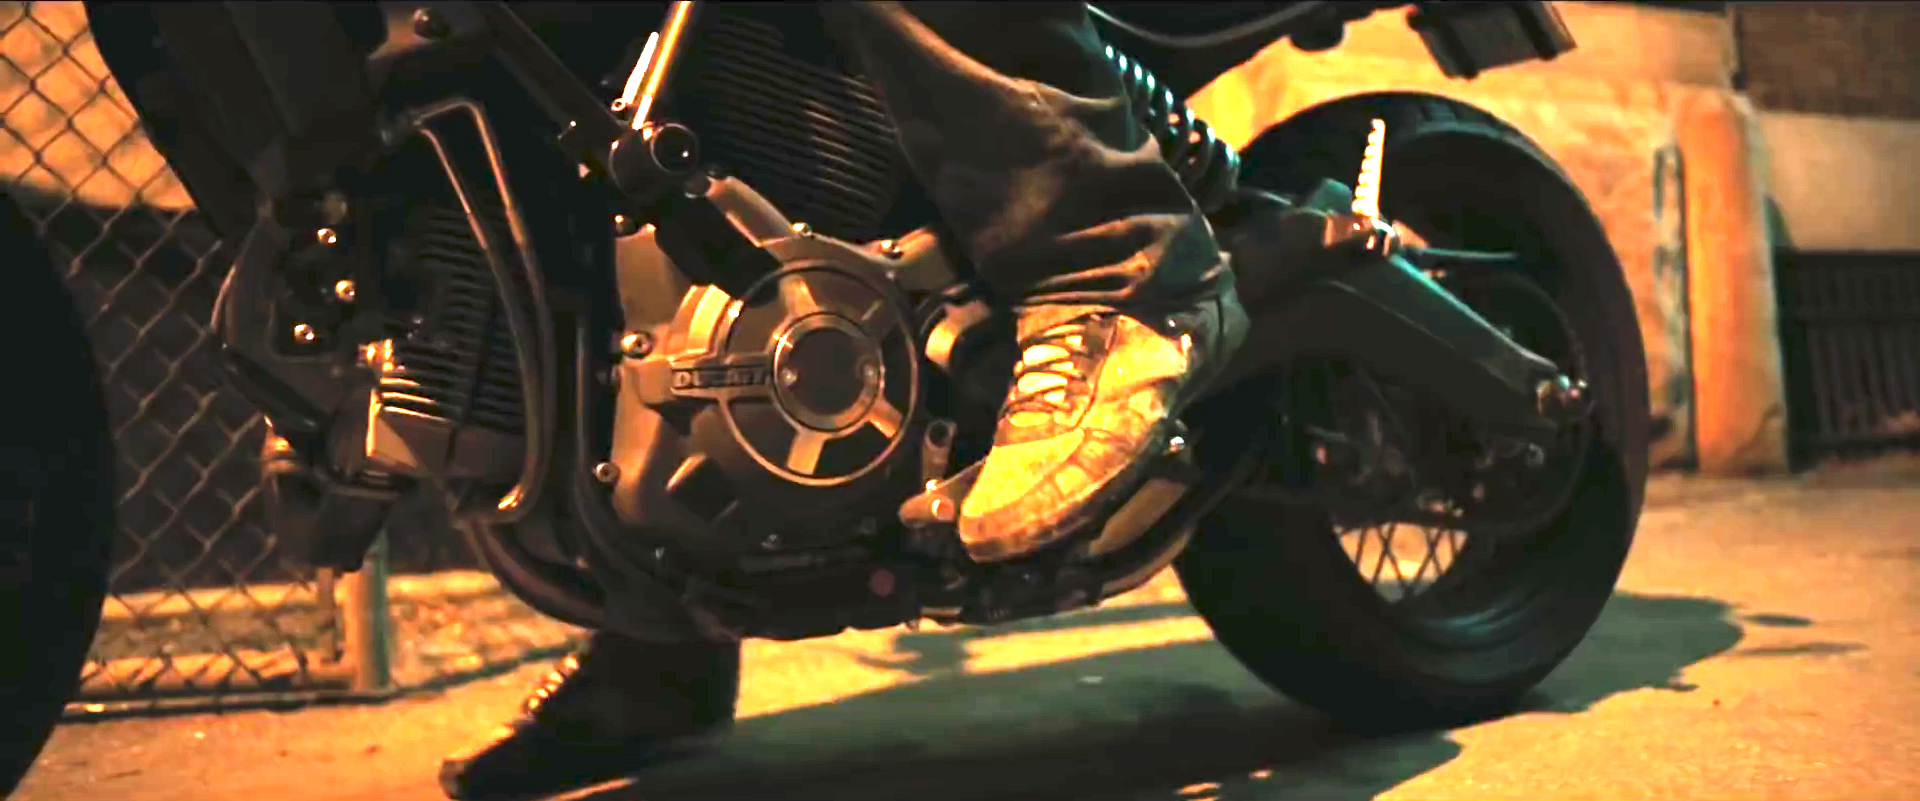 Venom Movie Motorcycle